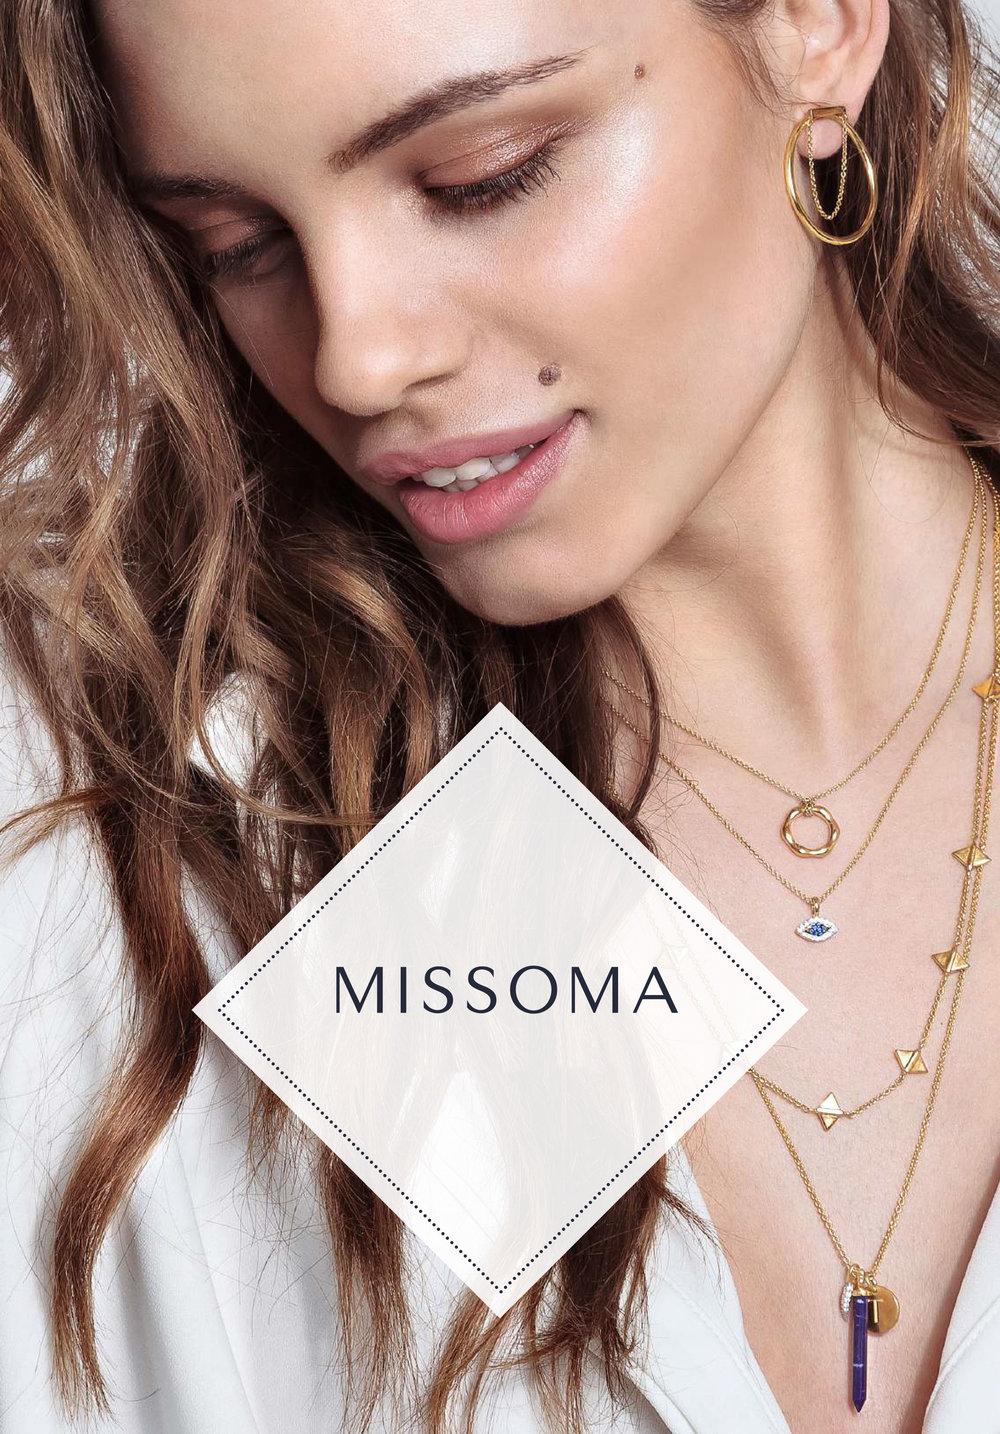 missoma_05.jpg